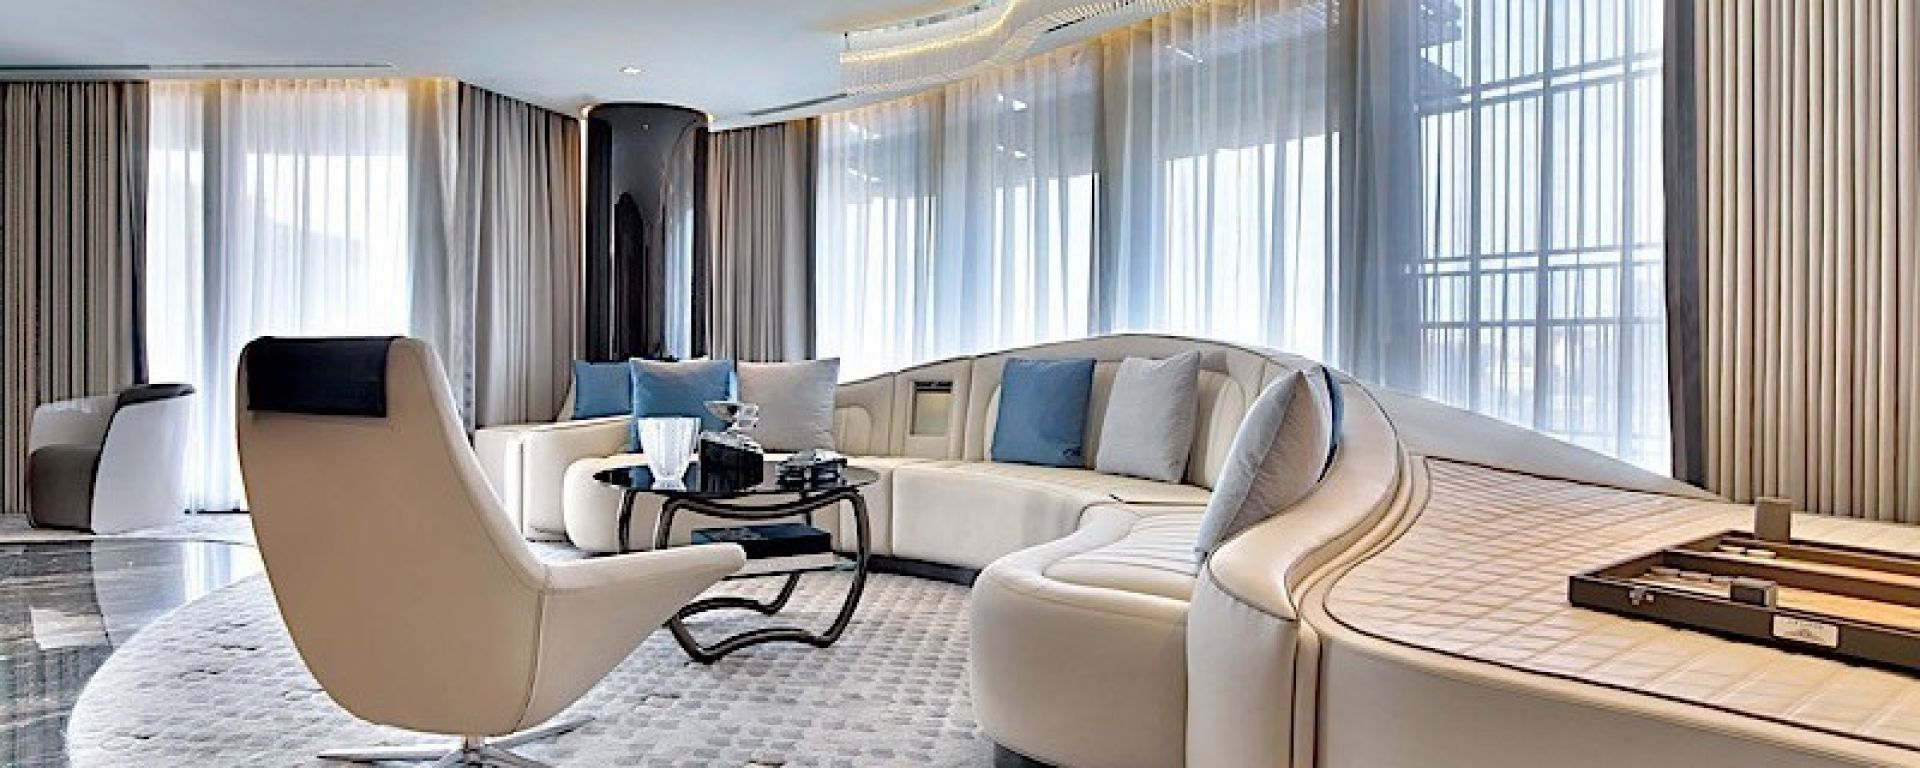 Istanbul: una suite firmata Bentley al St. Regis Hotel